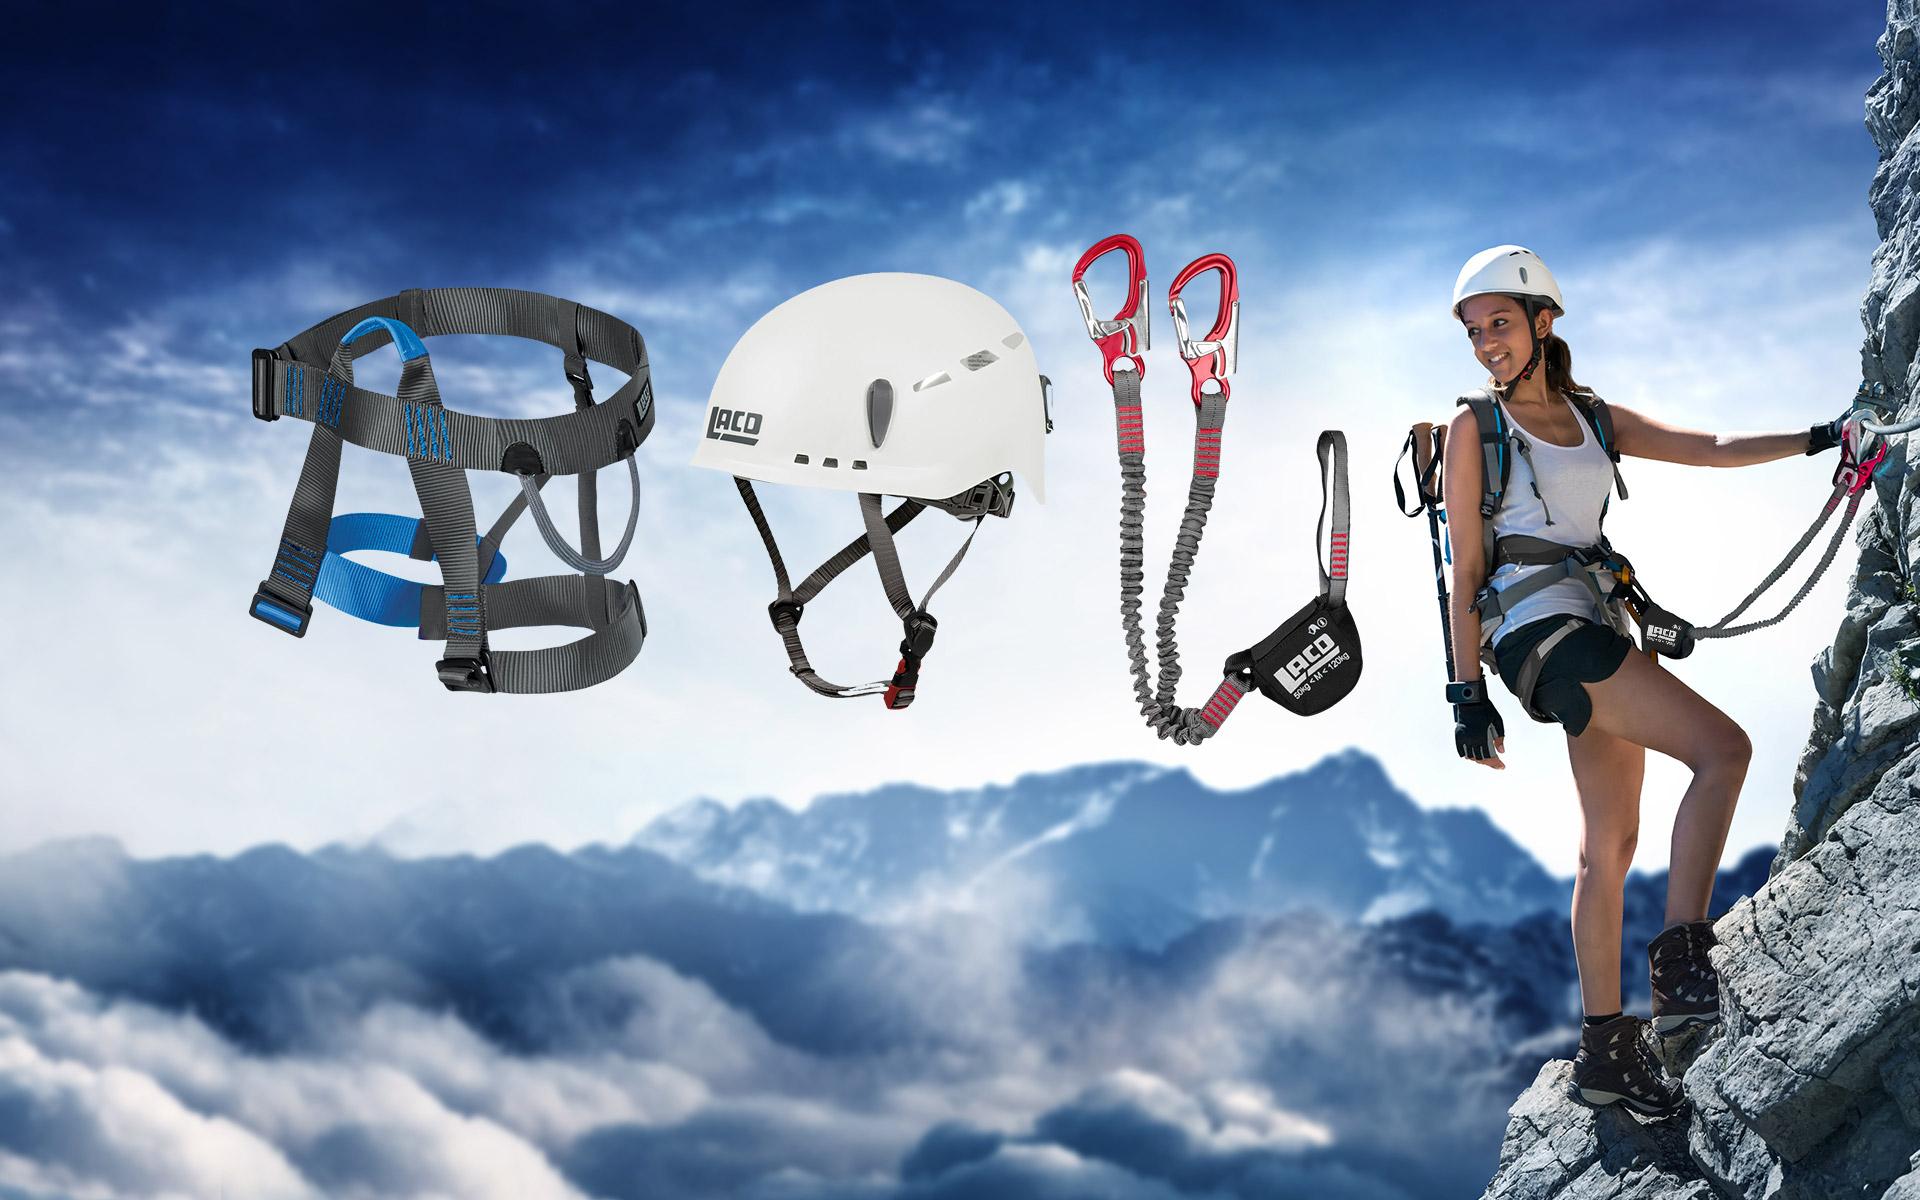 Lacd Klettergurt Test : Qsport lacd klettersteig set